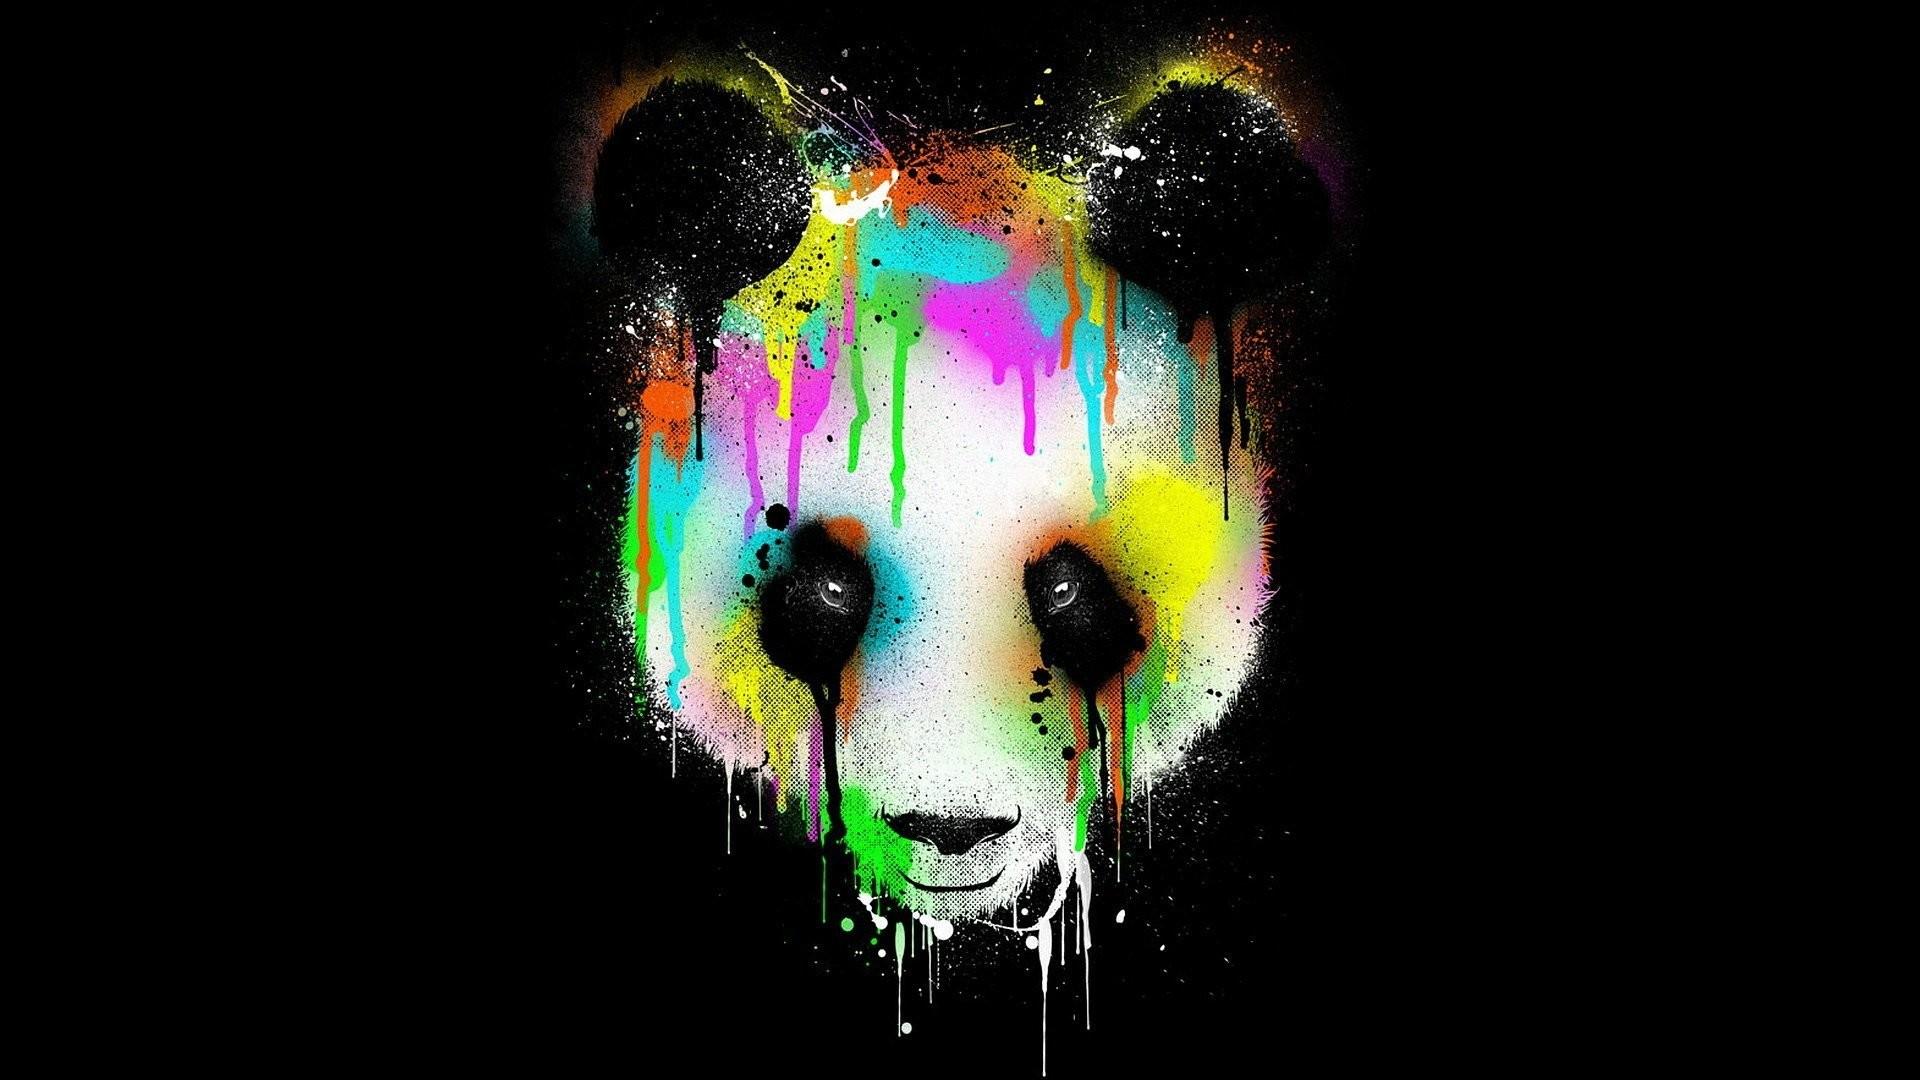 Res: 1920x1080, HD Wallpaper   Background Image ID:524941.  Animal Panda